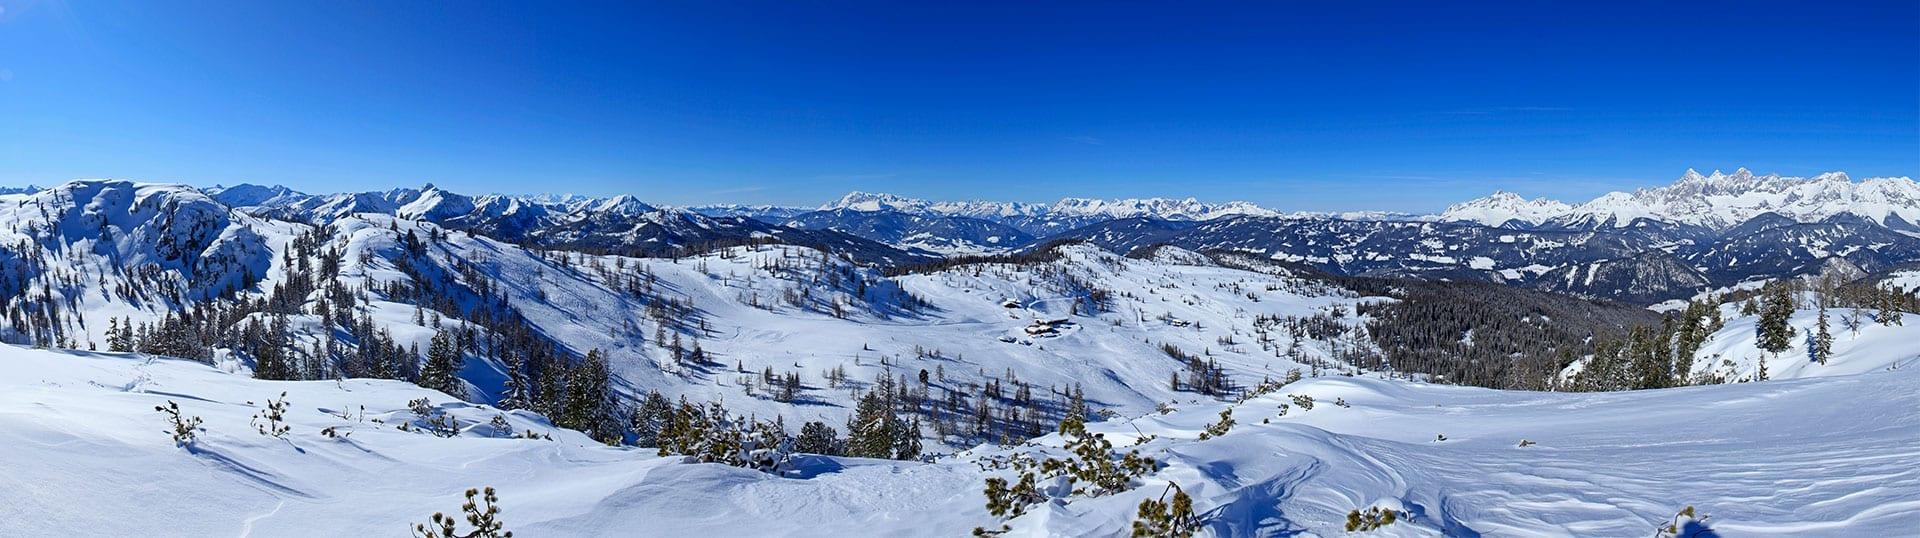 Skiurlaub im Skigebiet Fageralm in Ski amadé